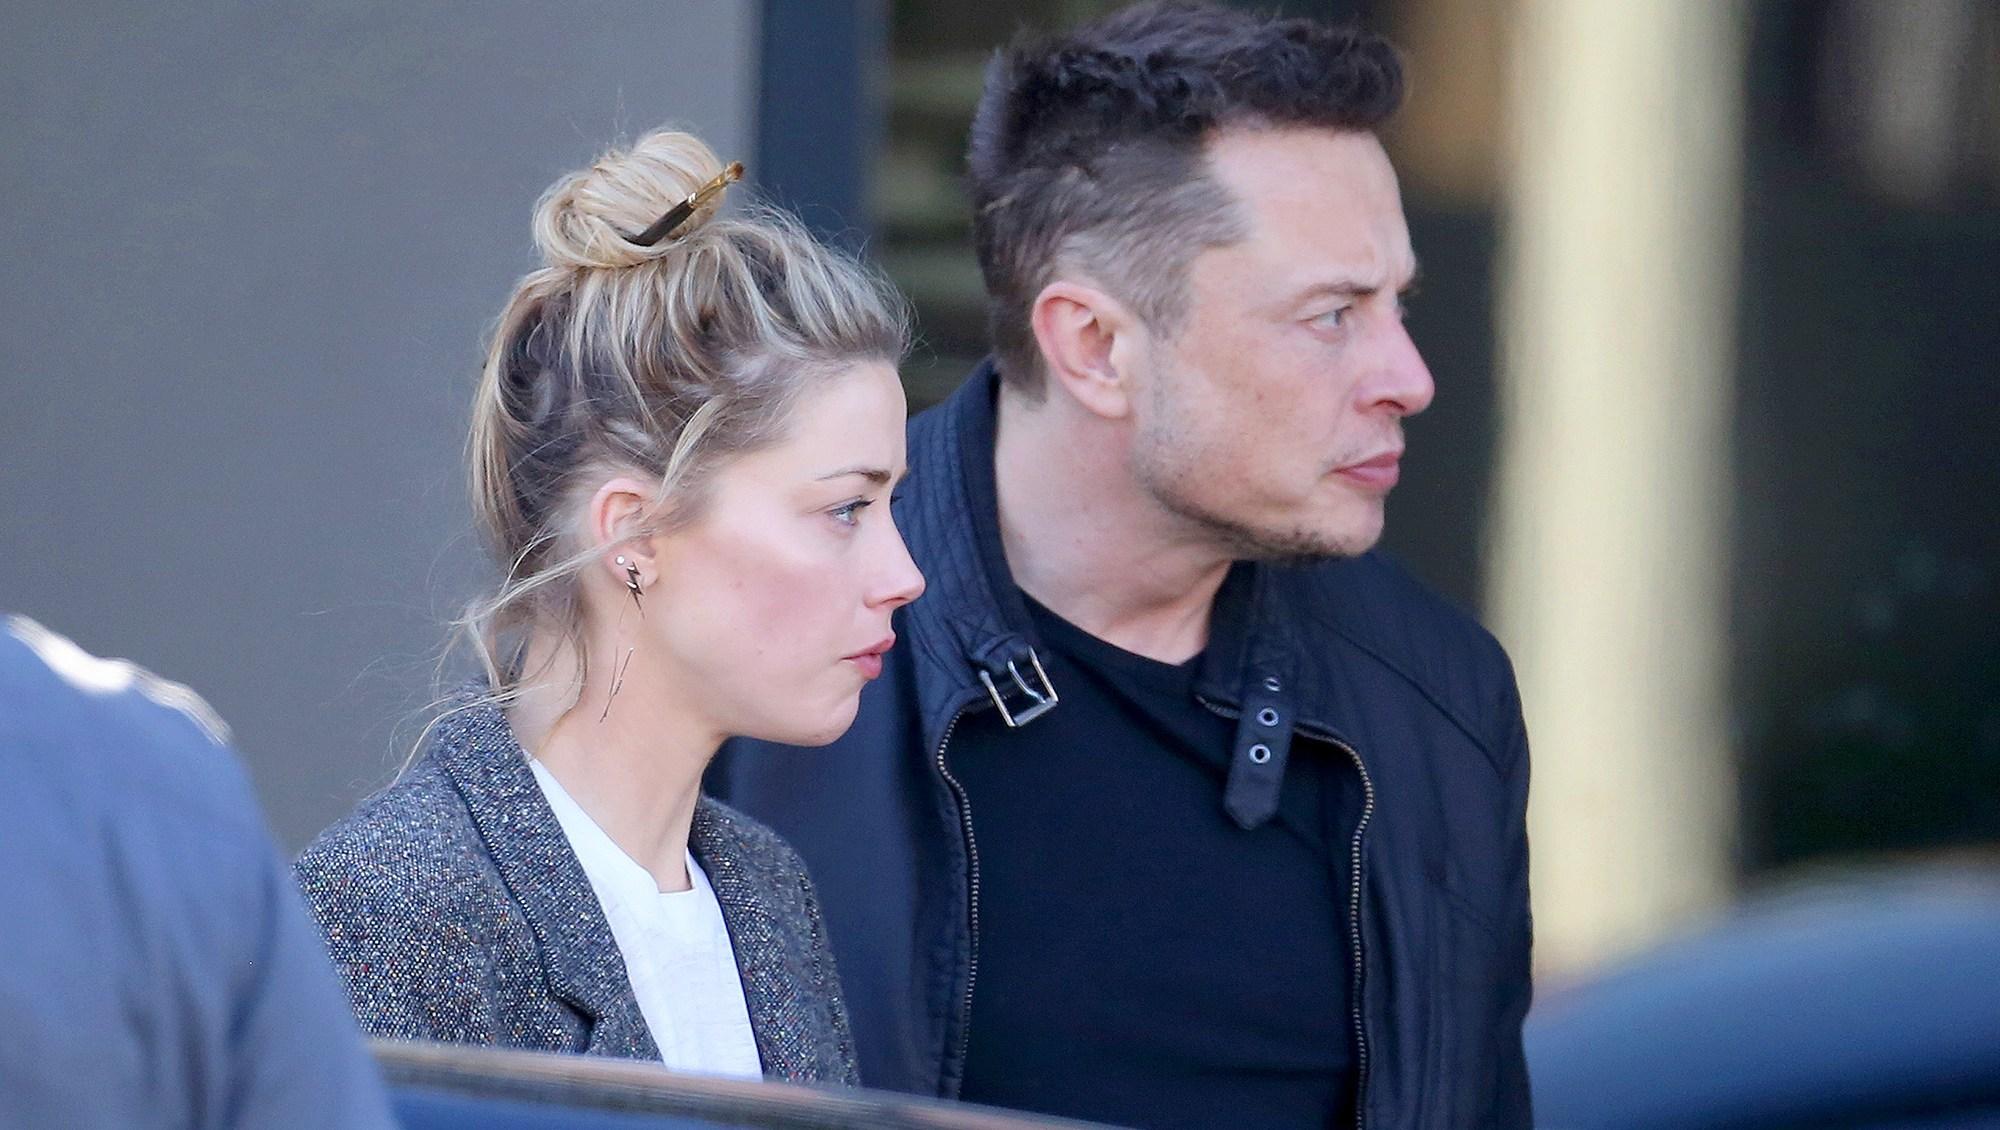 Elon Musk, Amber Heard, Kiss, SpaceX